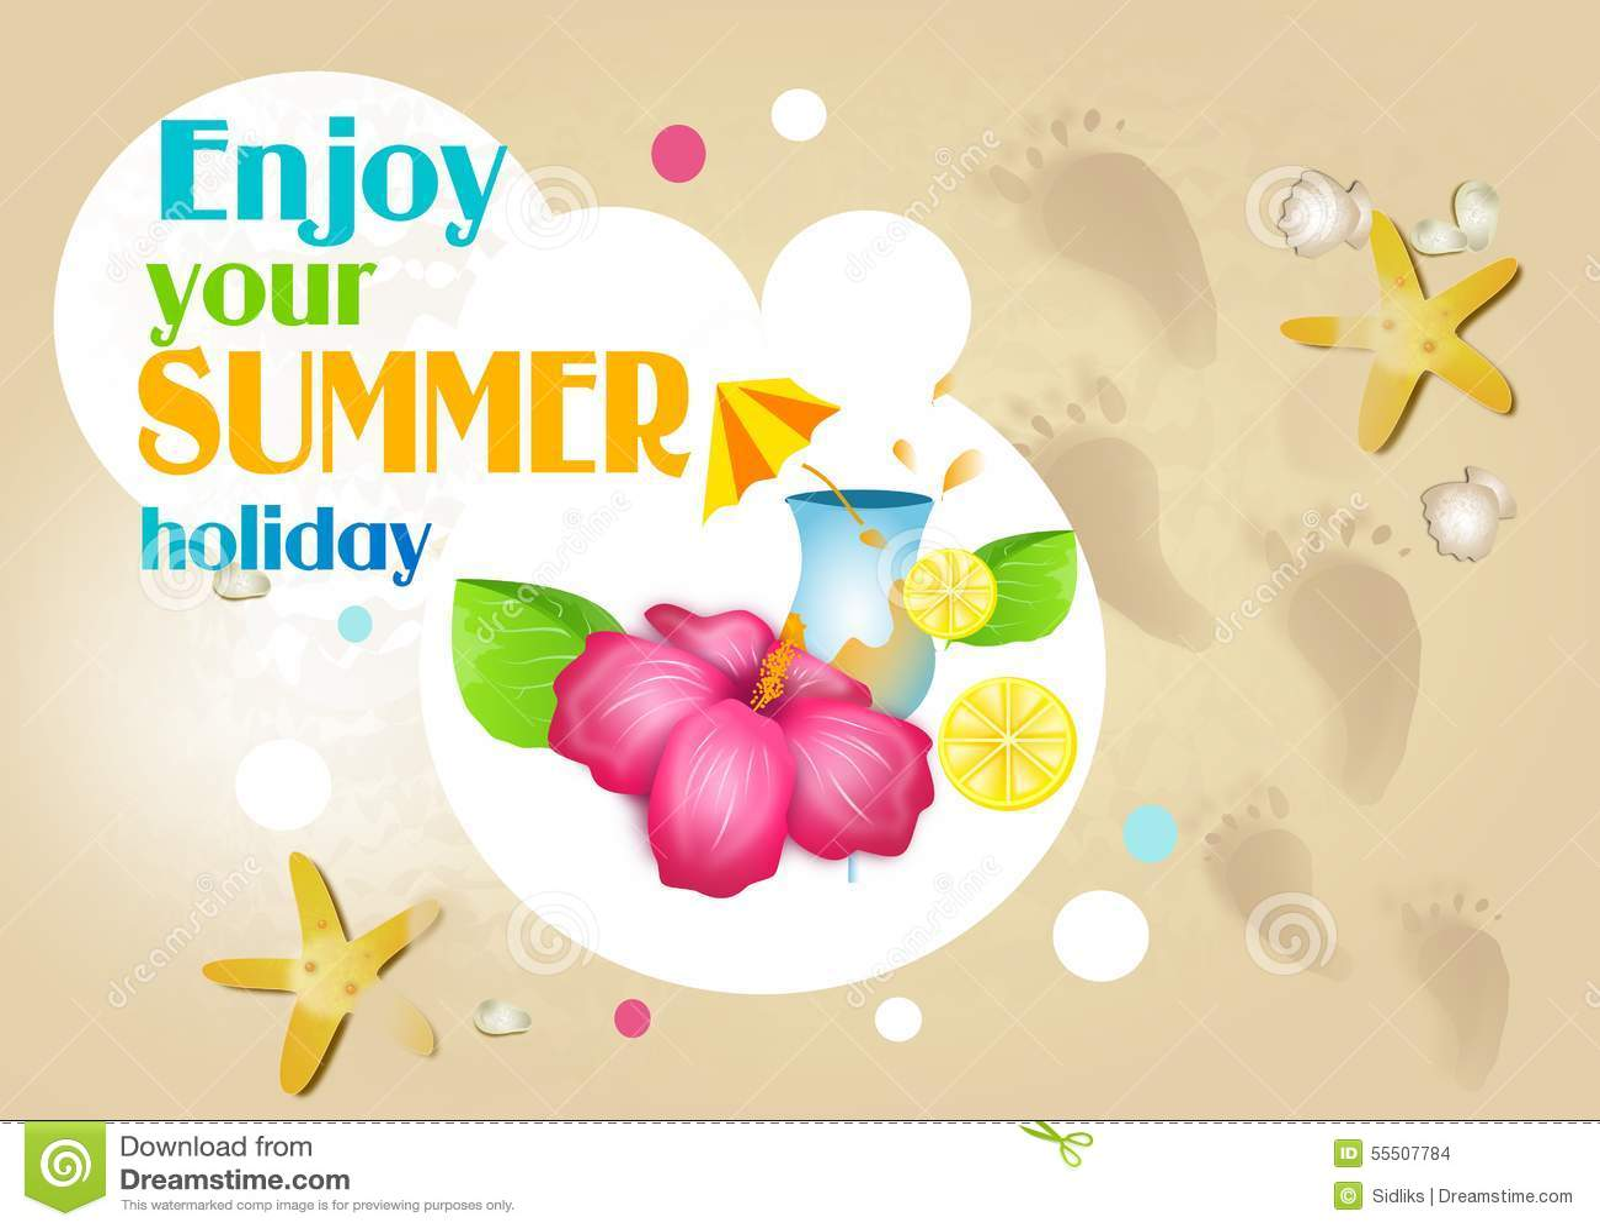 Enjoy Your Summer Holiday Stock Illustration Illustration Of